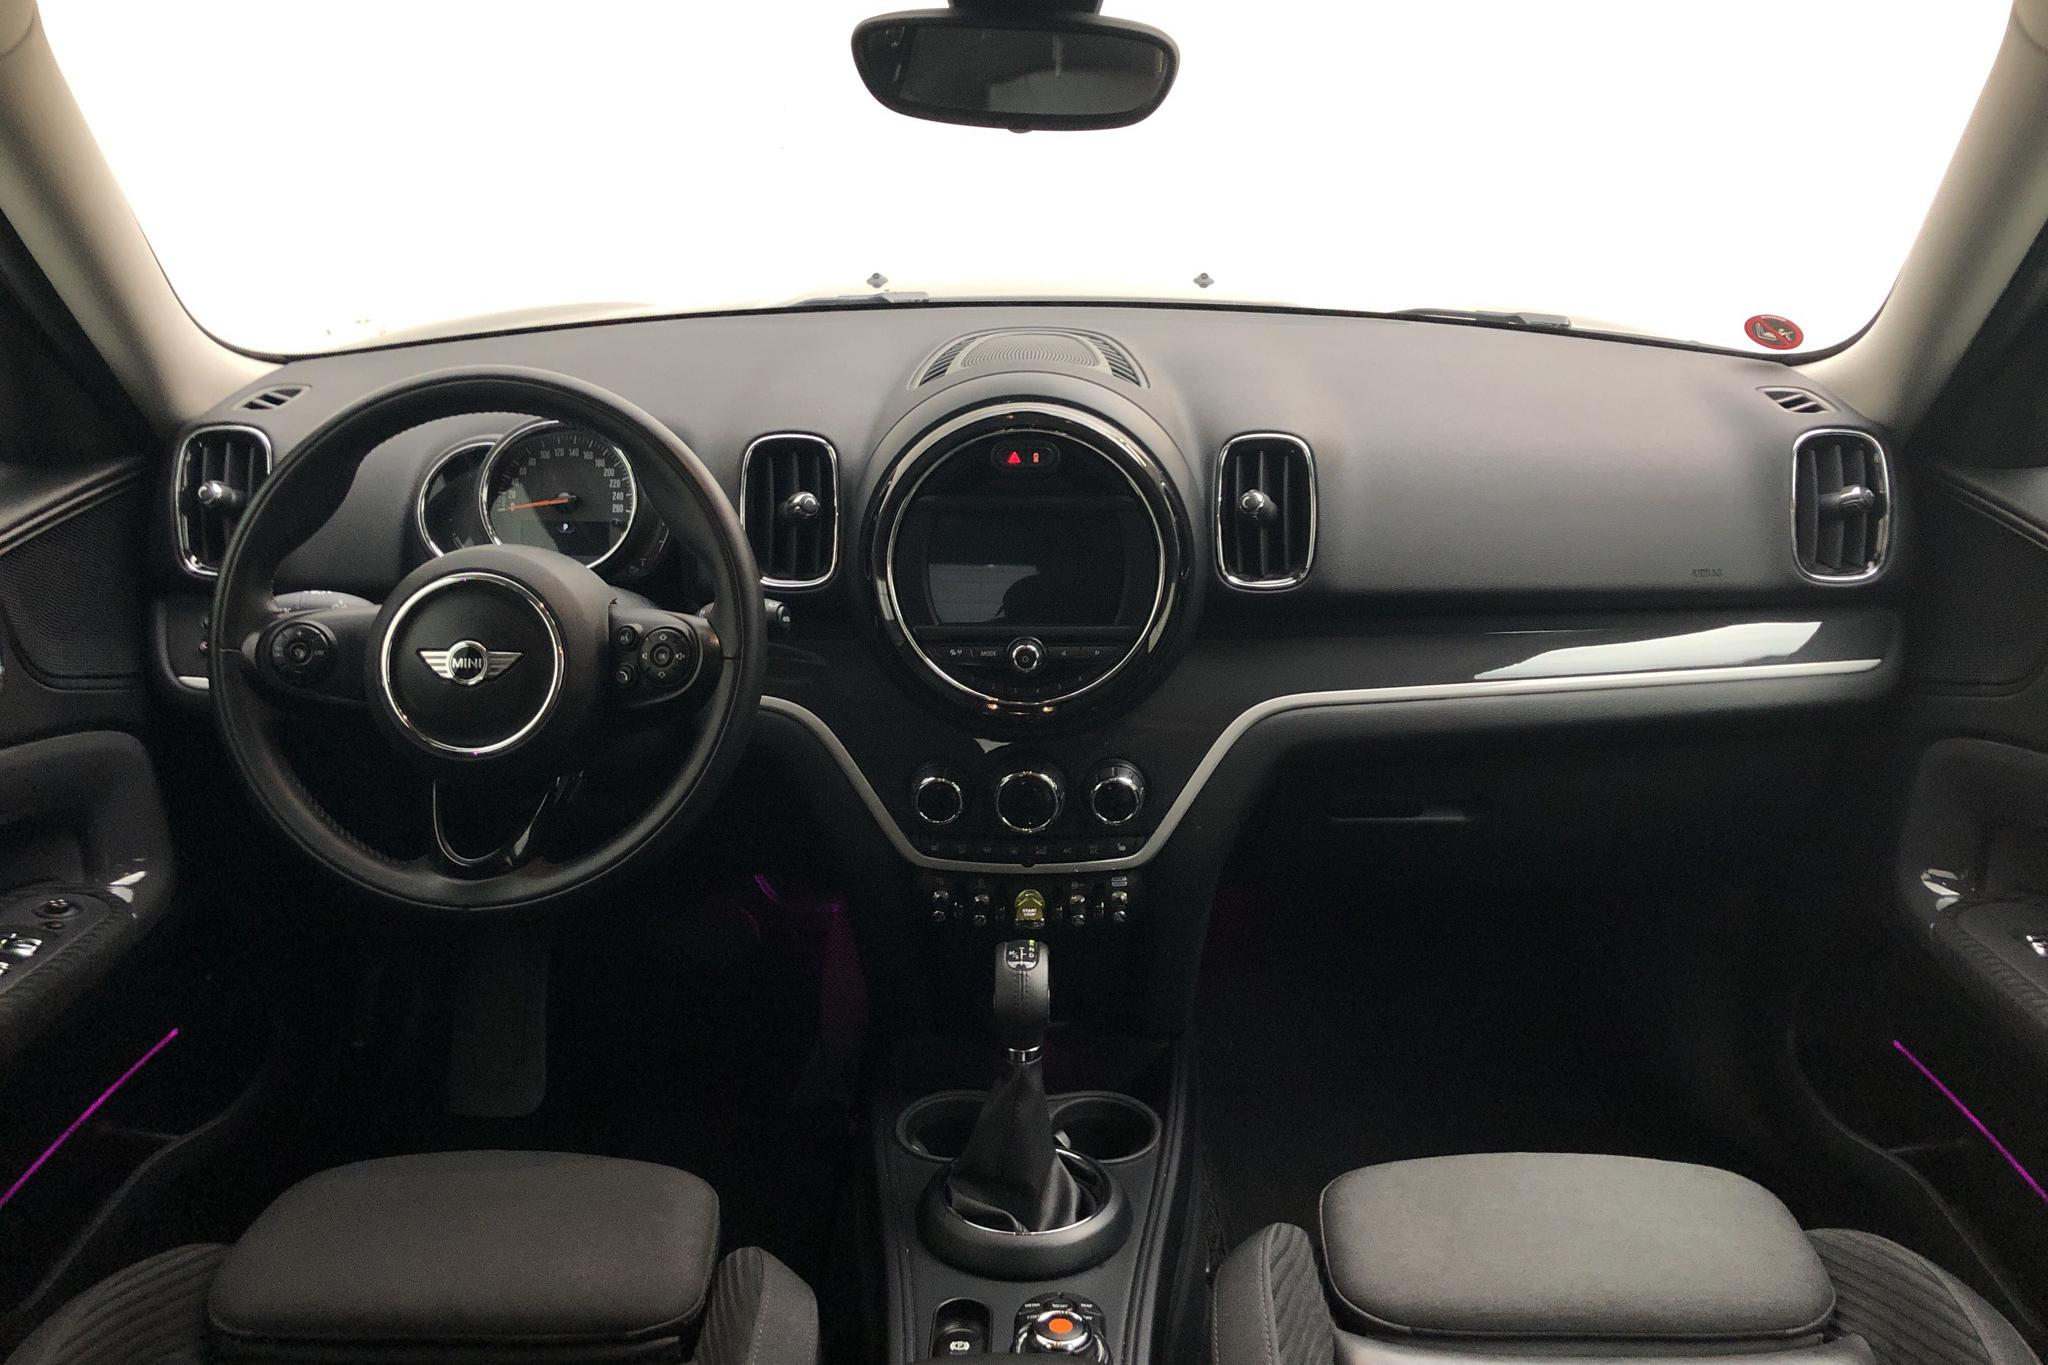 MINI Cooper S E ALL4 Countryman, F60 (224hk) - 9 080 mil - Automat - svart - 2018